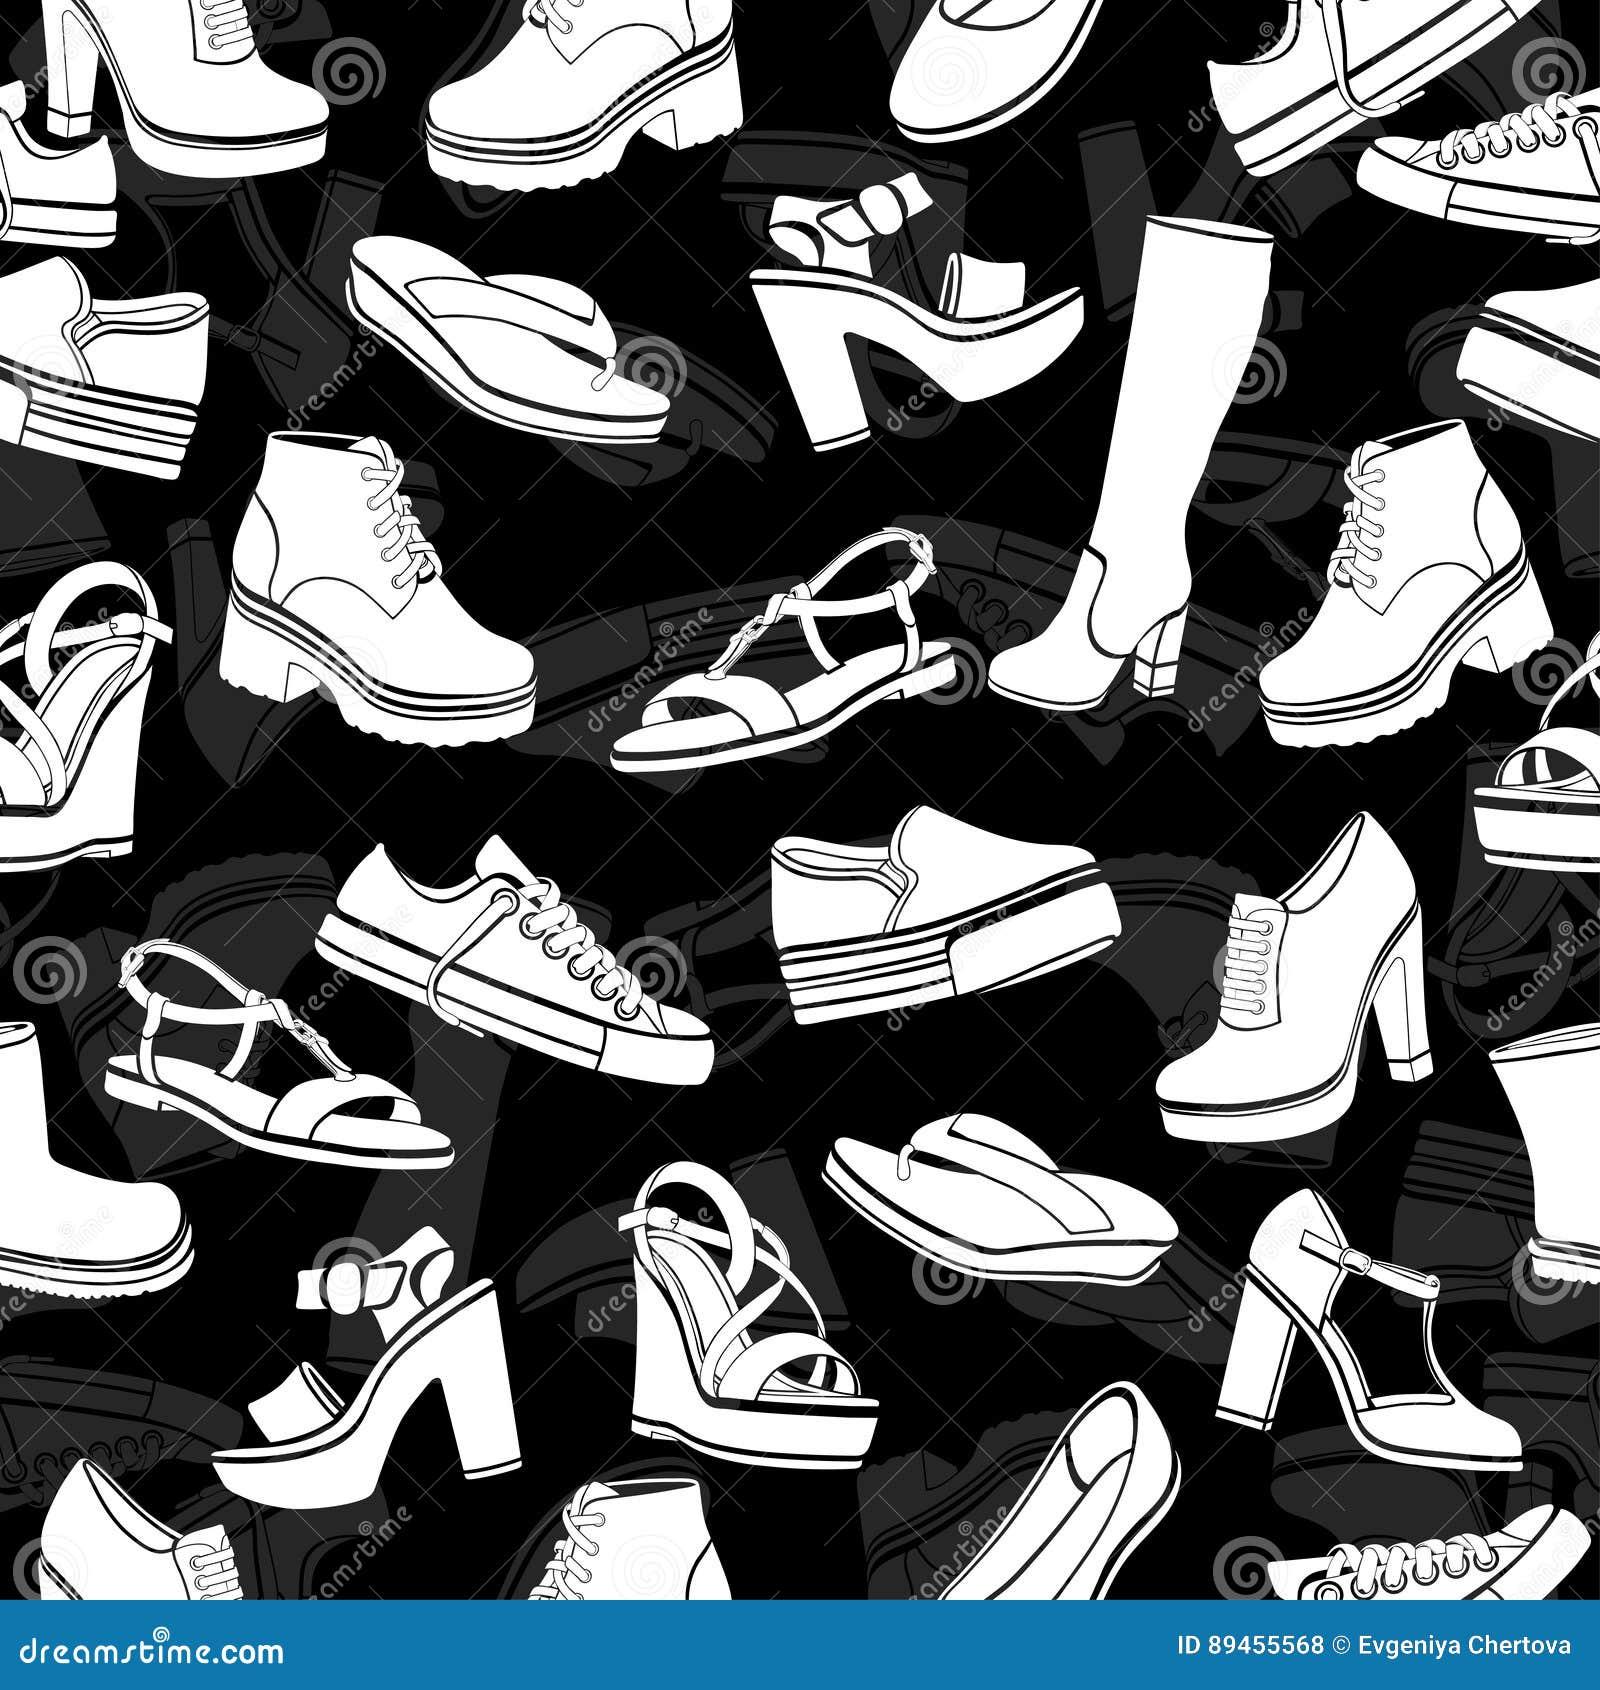 a32293527ad Διανυσματικό υπόβαθρο παπουτσιών, άνευ ραφής σχέδιο Άσπρα σανδάλια, μπότες,  χαμηλό παπούτσι, παντόφλες μπαλέτου, Gumshoes, γόνατο Διανυσματική  απεικόνιση ...